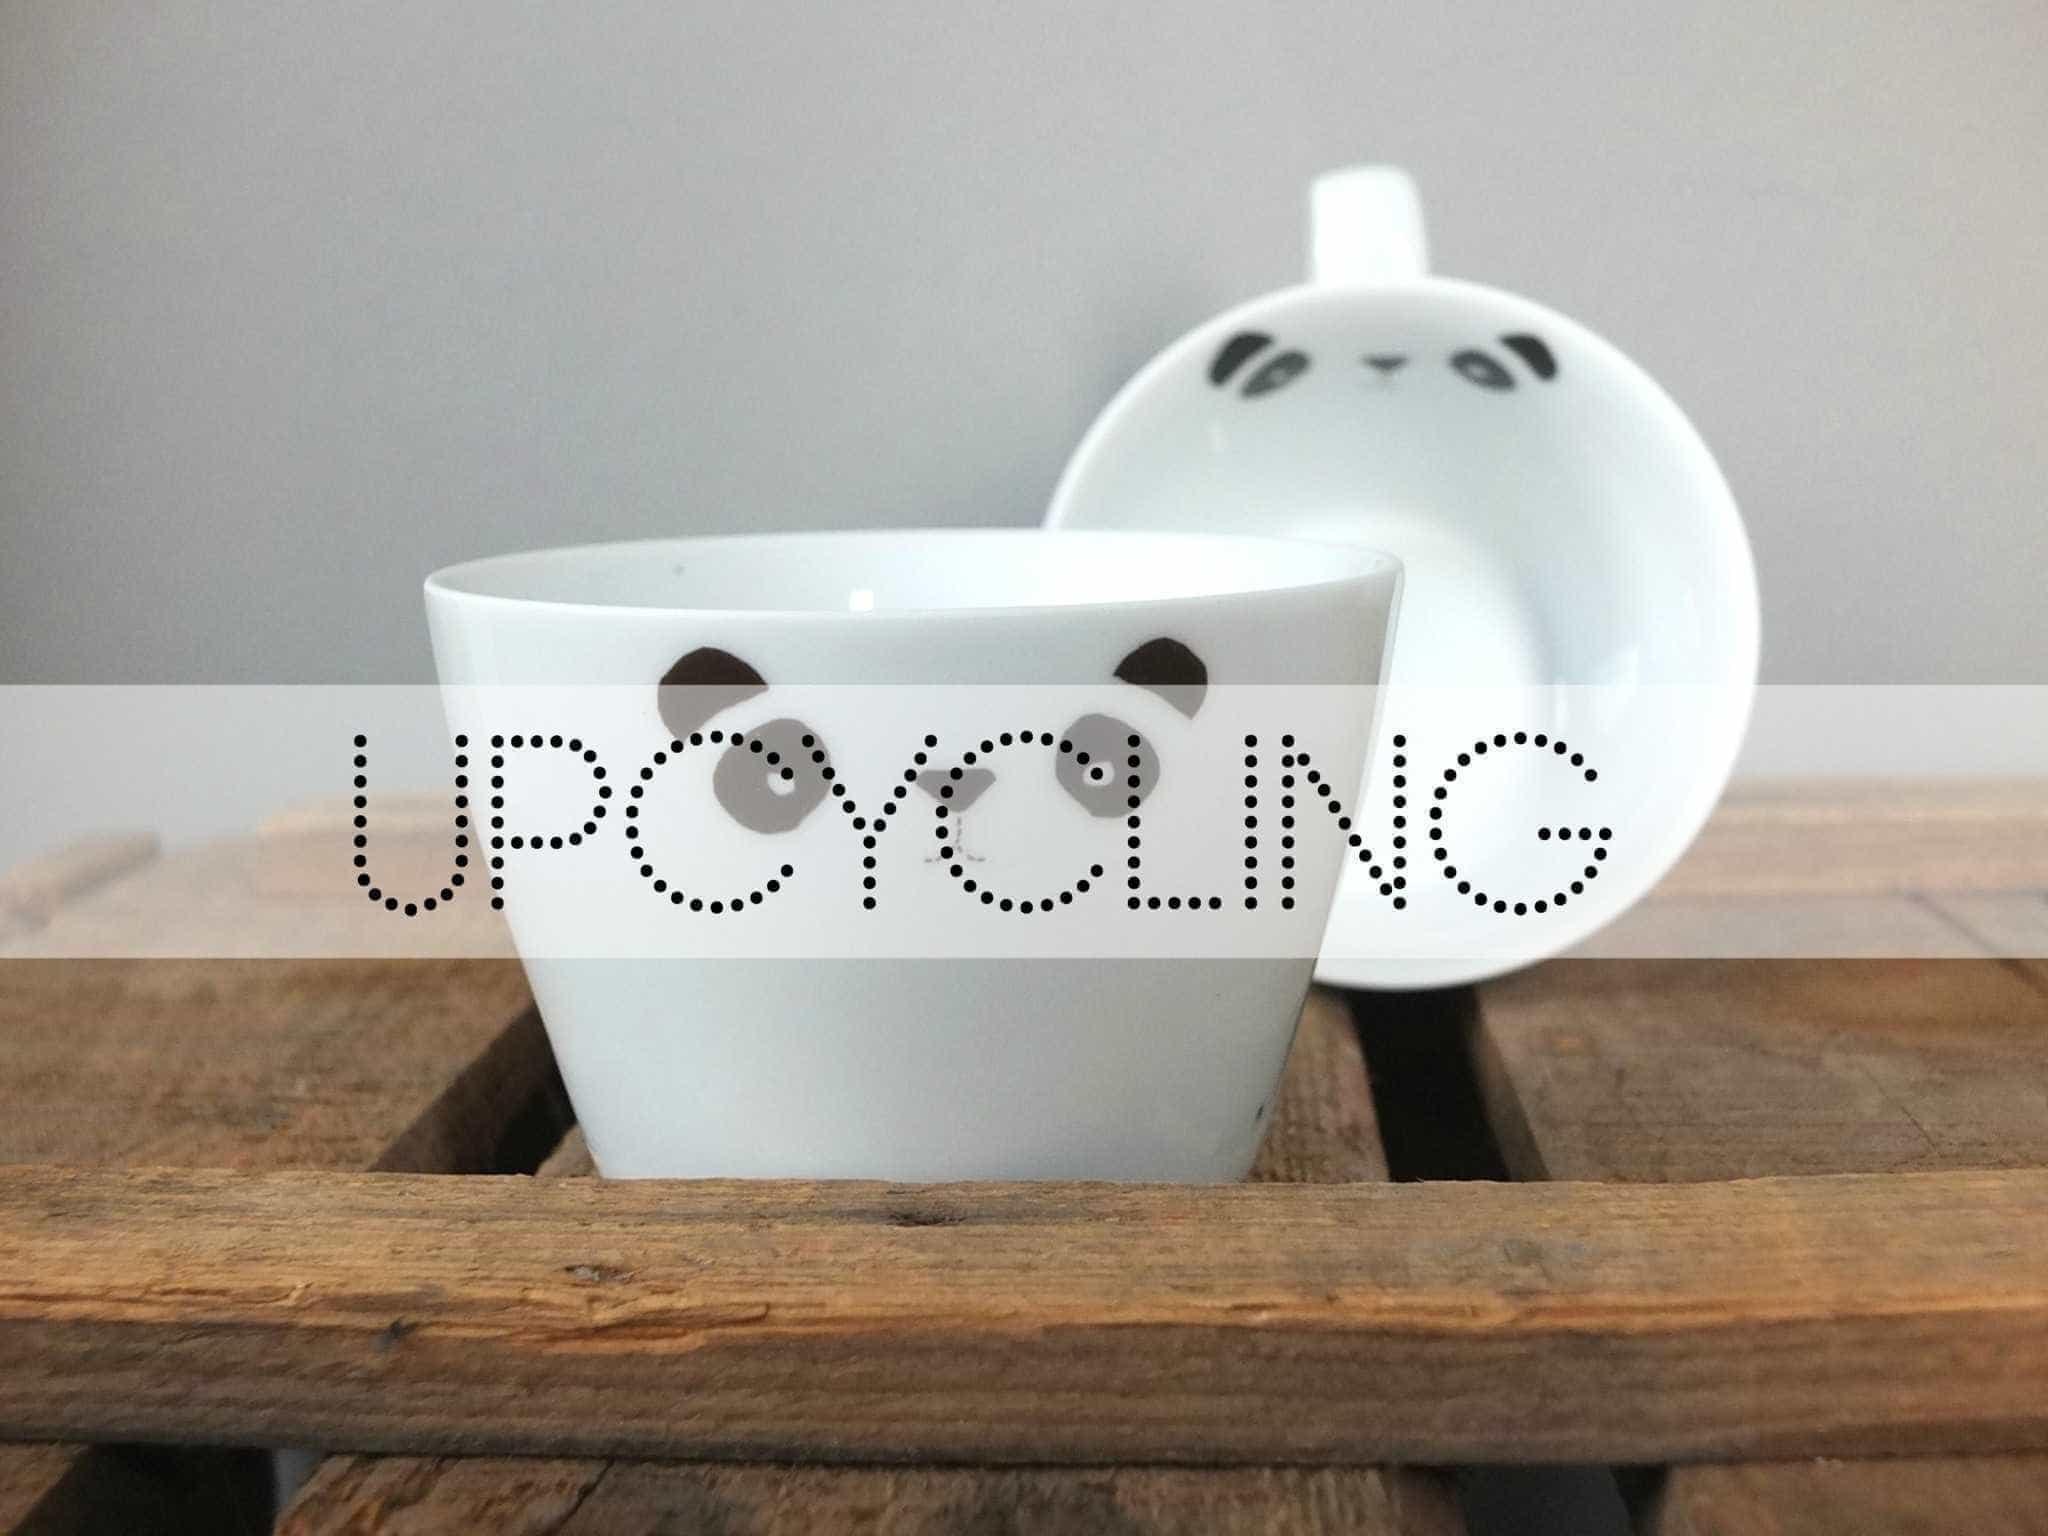 WOHNGOLDSTÜCK » [Upcycling] ↠ Porzellansticker! So einfach ...